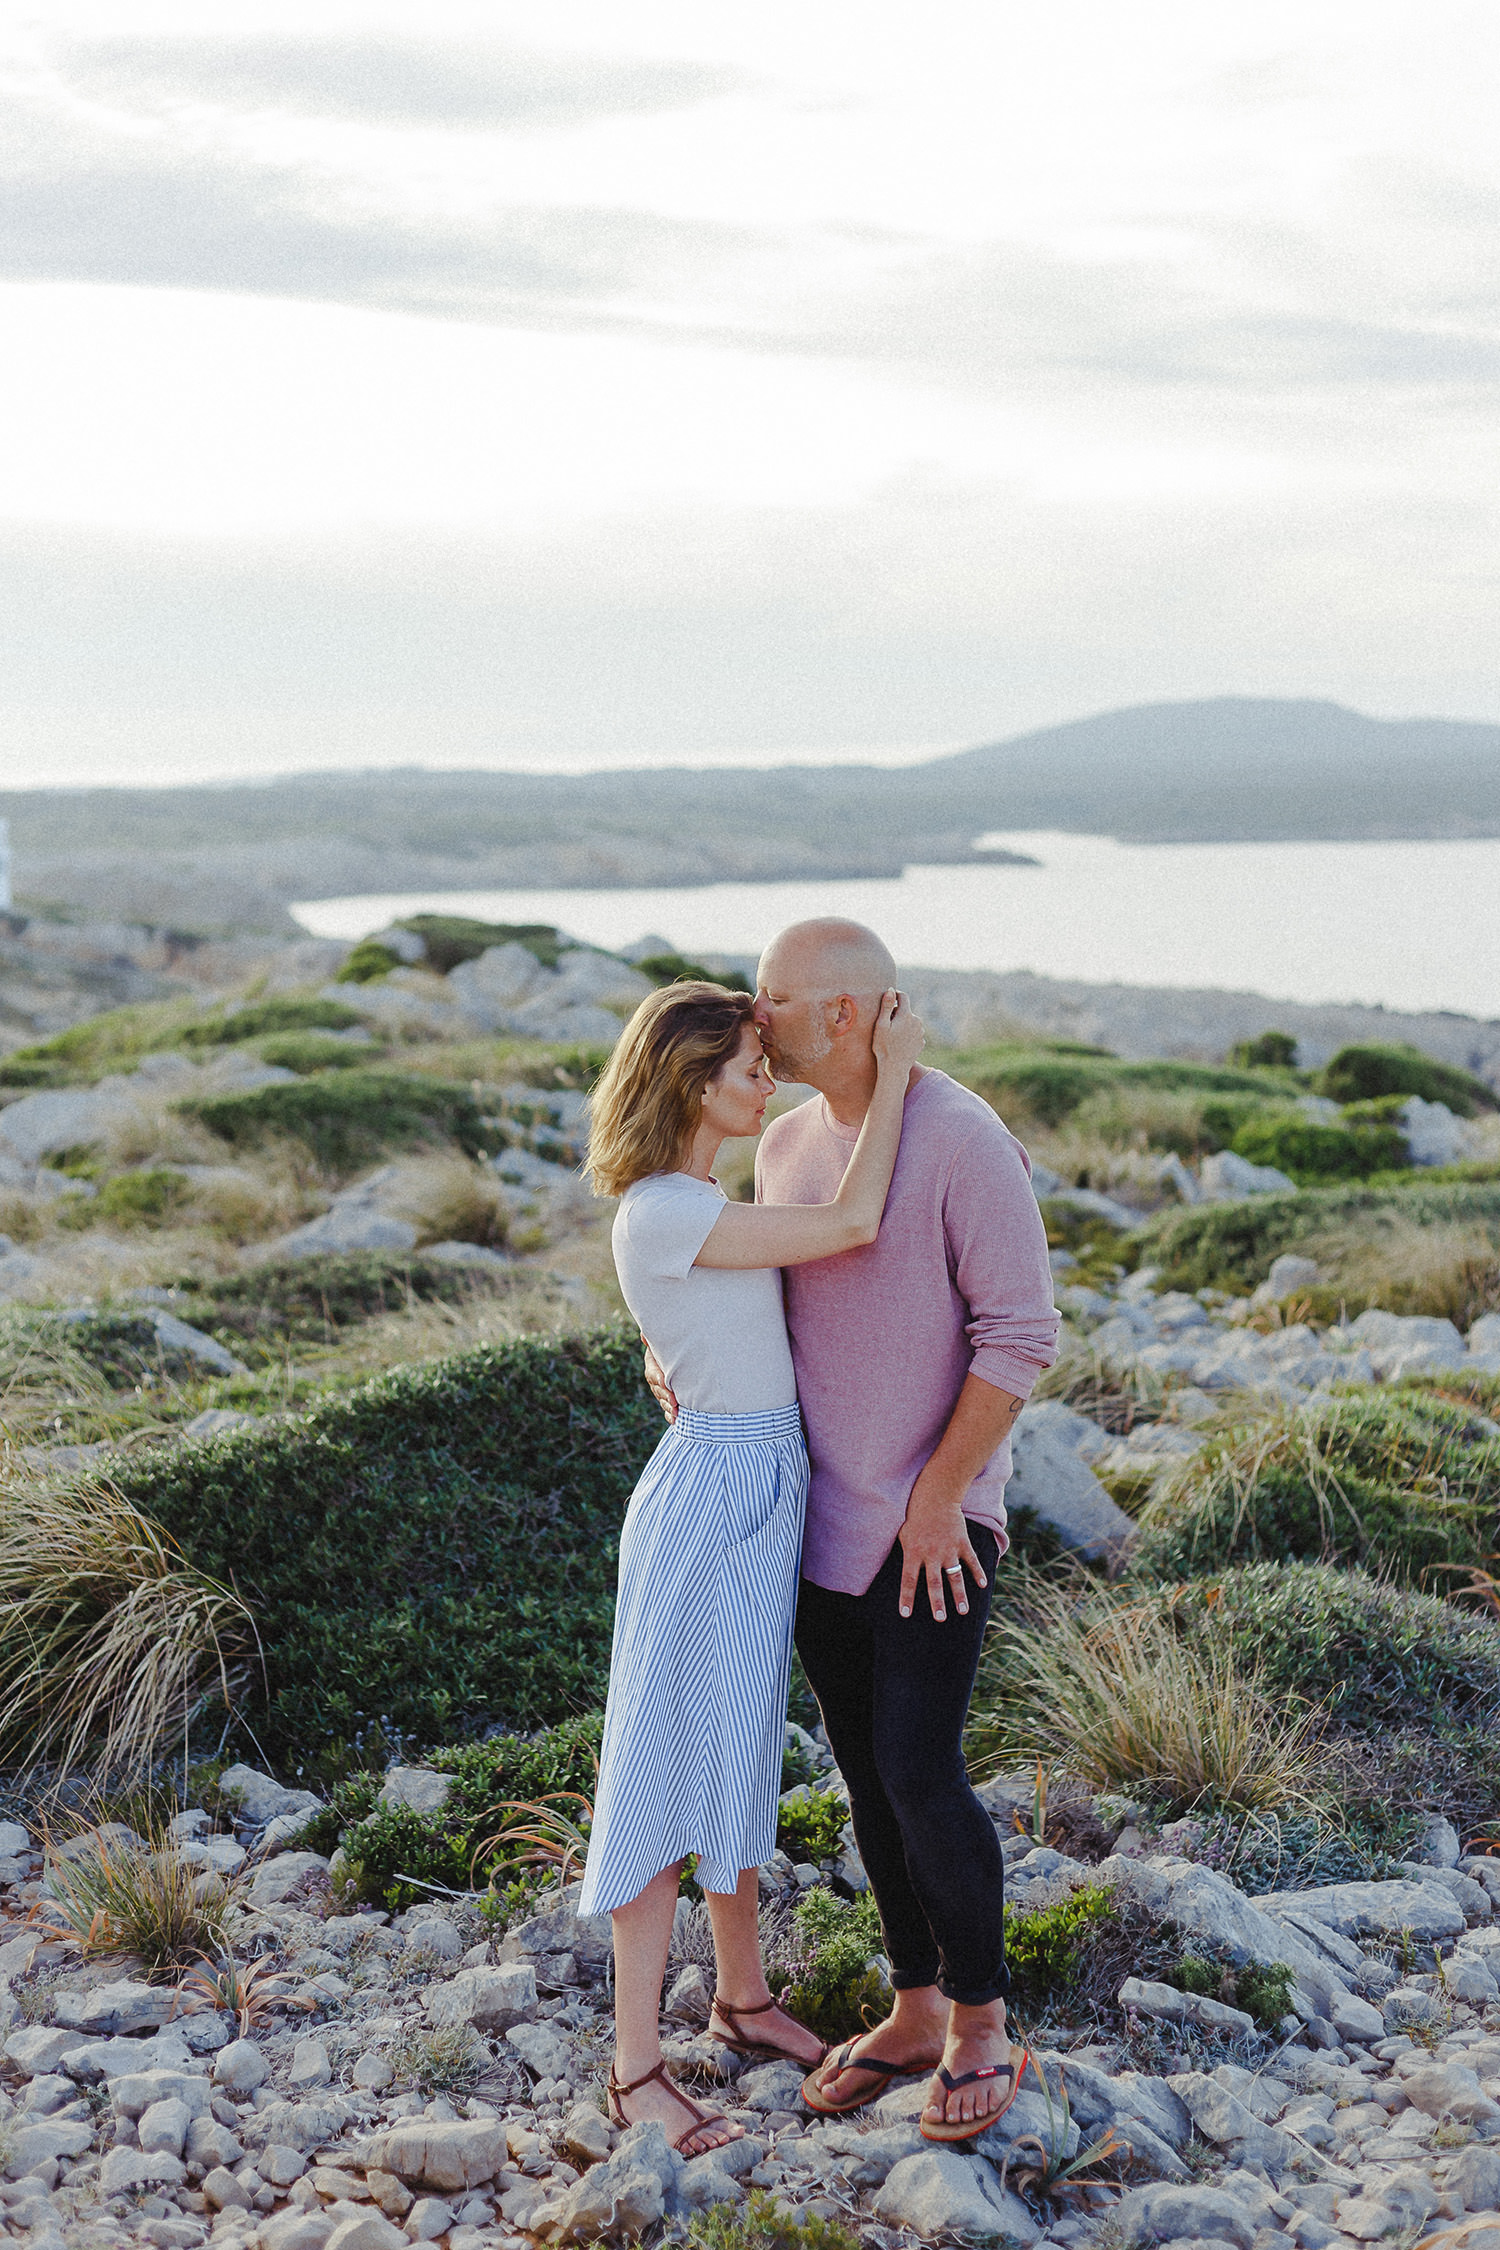 Fotograf / Hochzeitsfotograf auf Mallorca